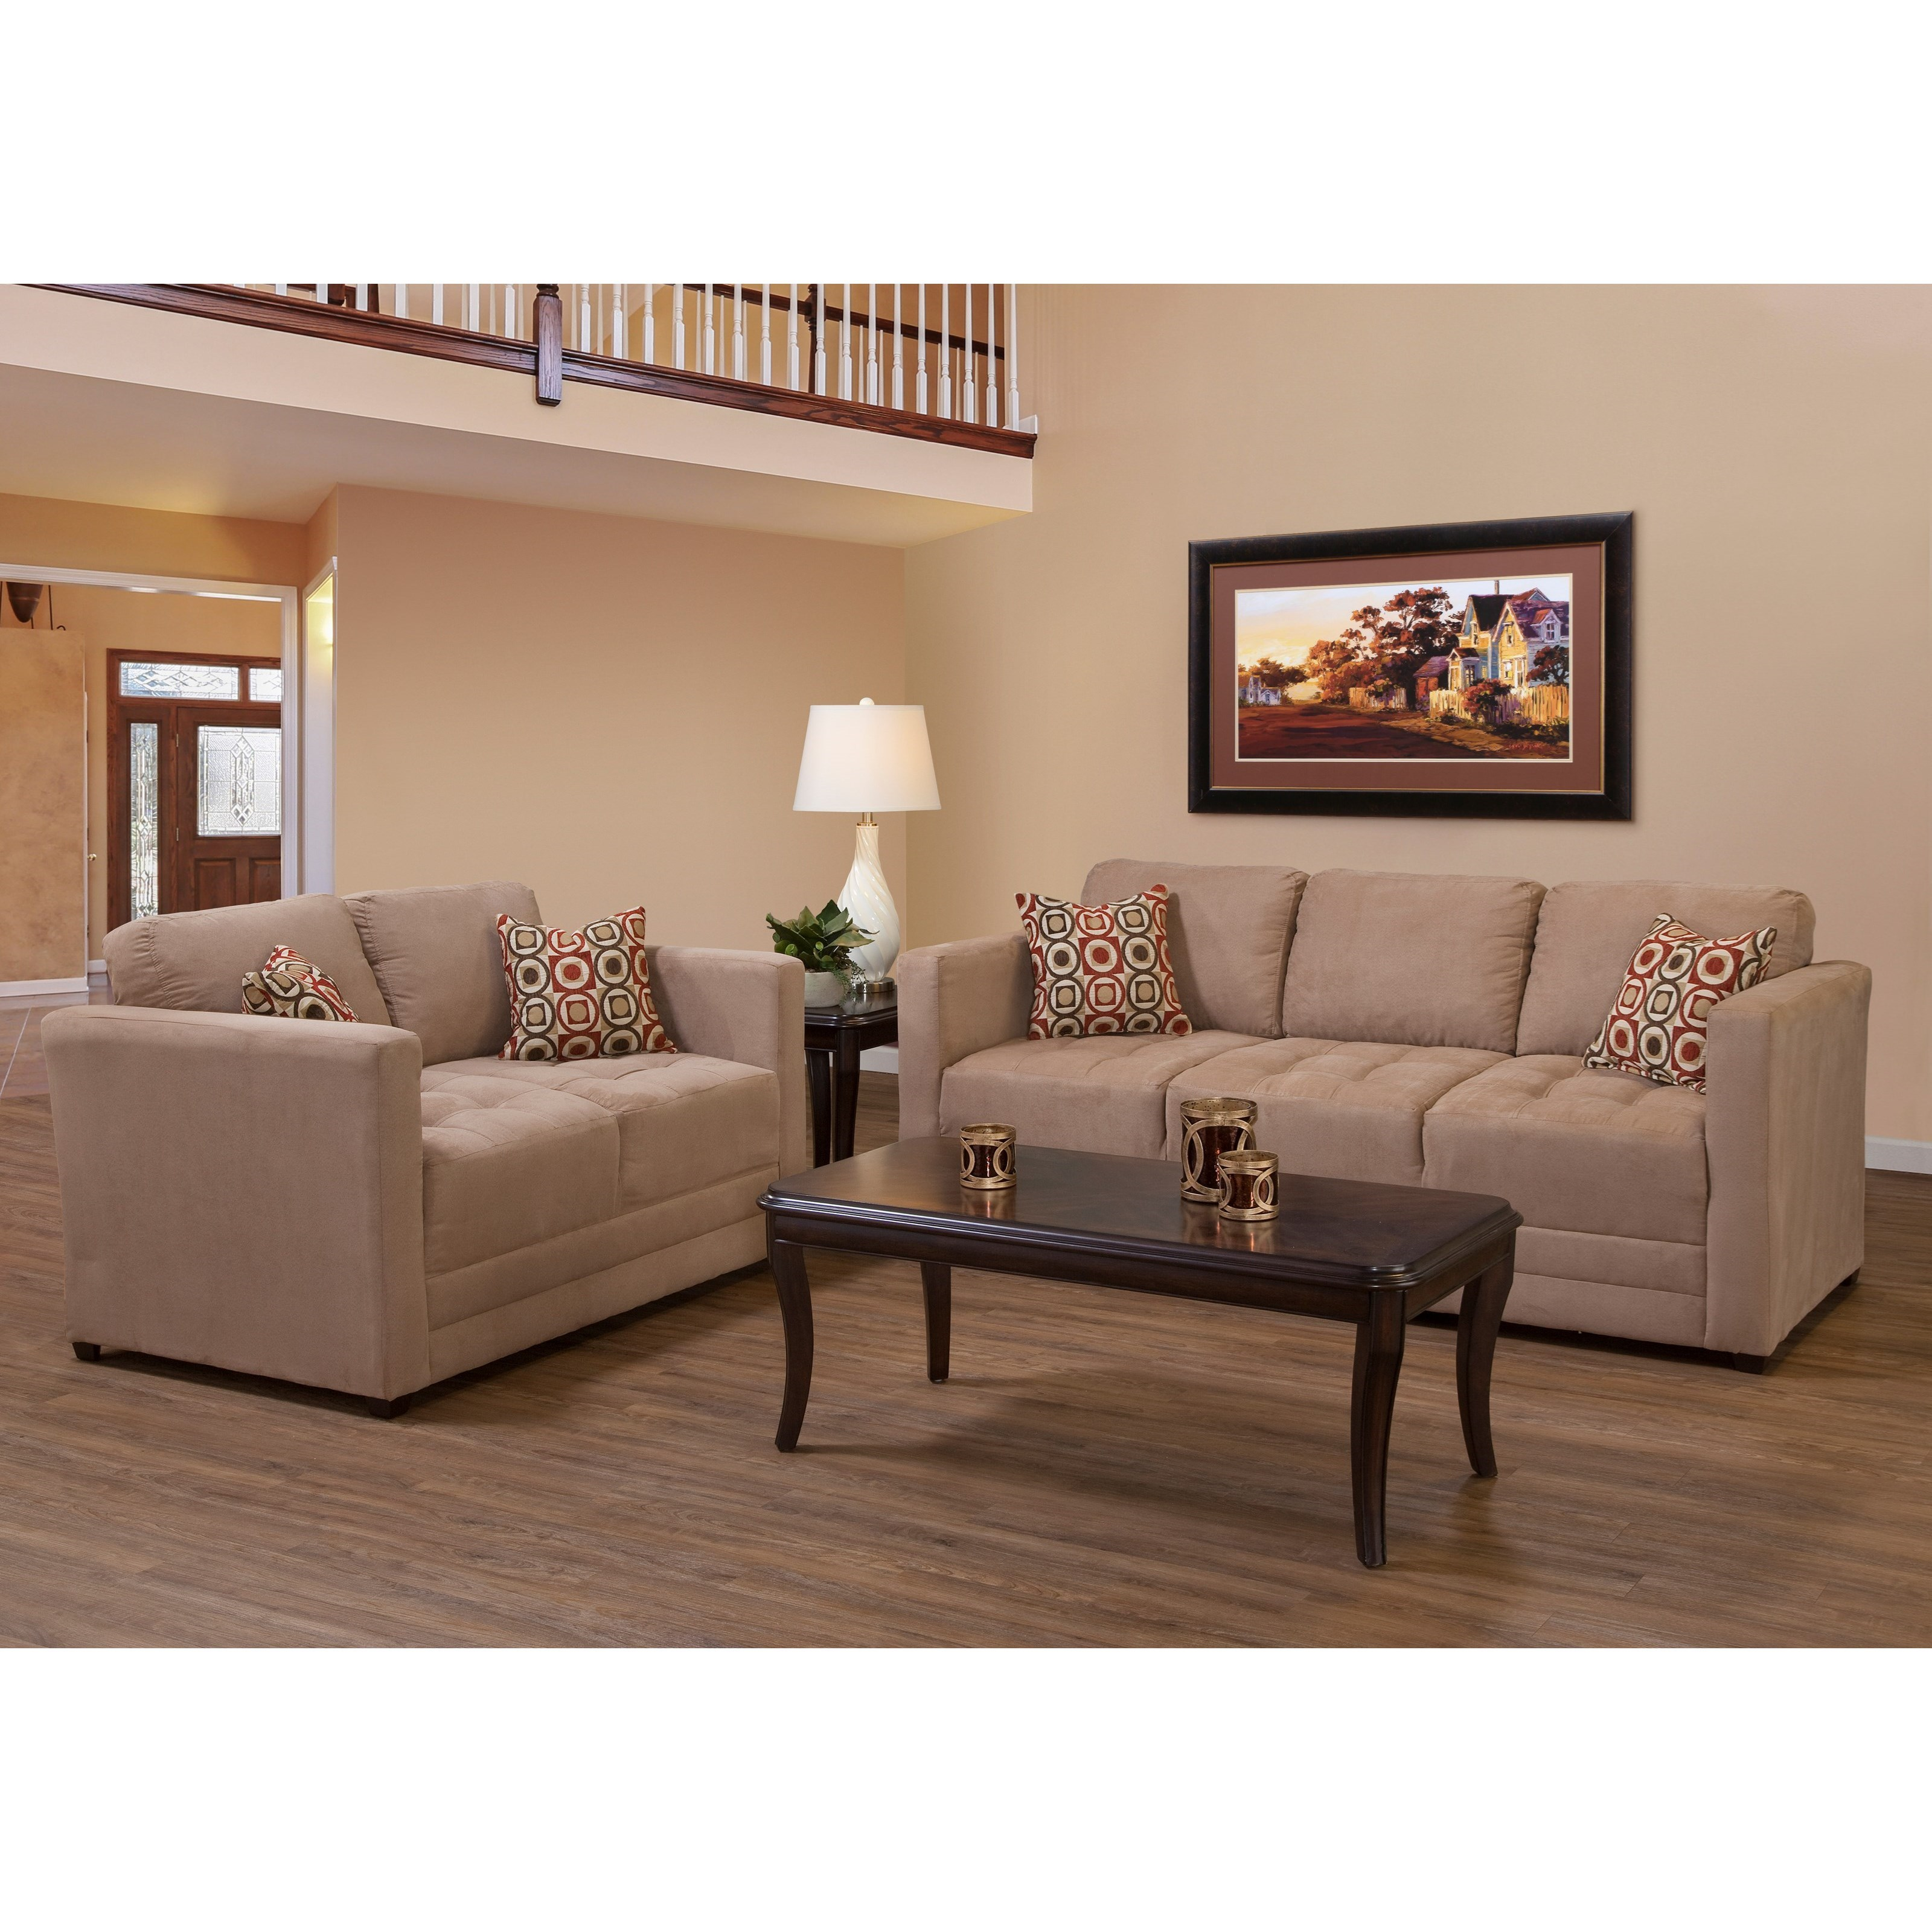 Living Room Design No Sofa: Serta Upholstery By Hughes Furniture 1085 Contemporary